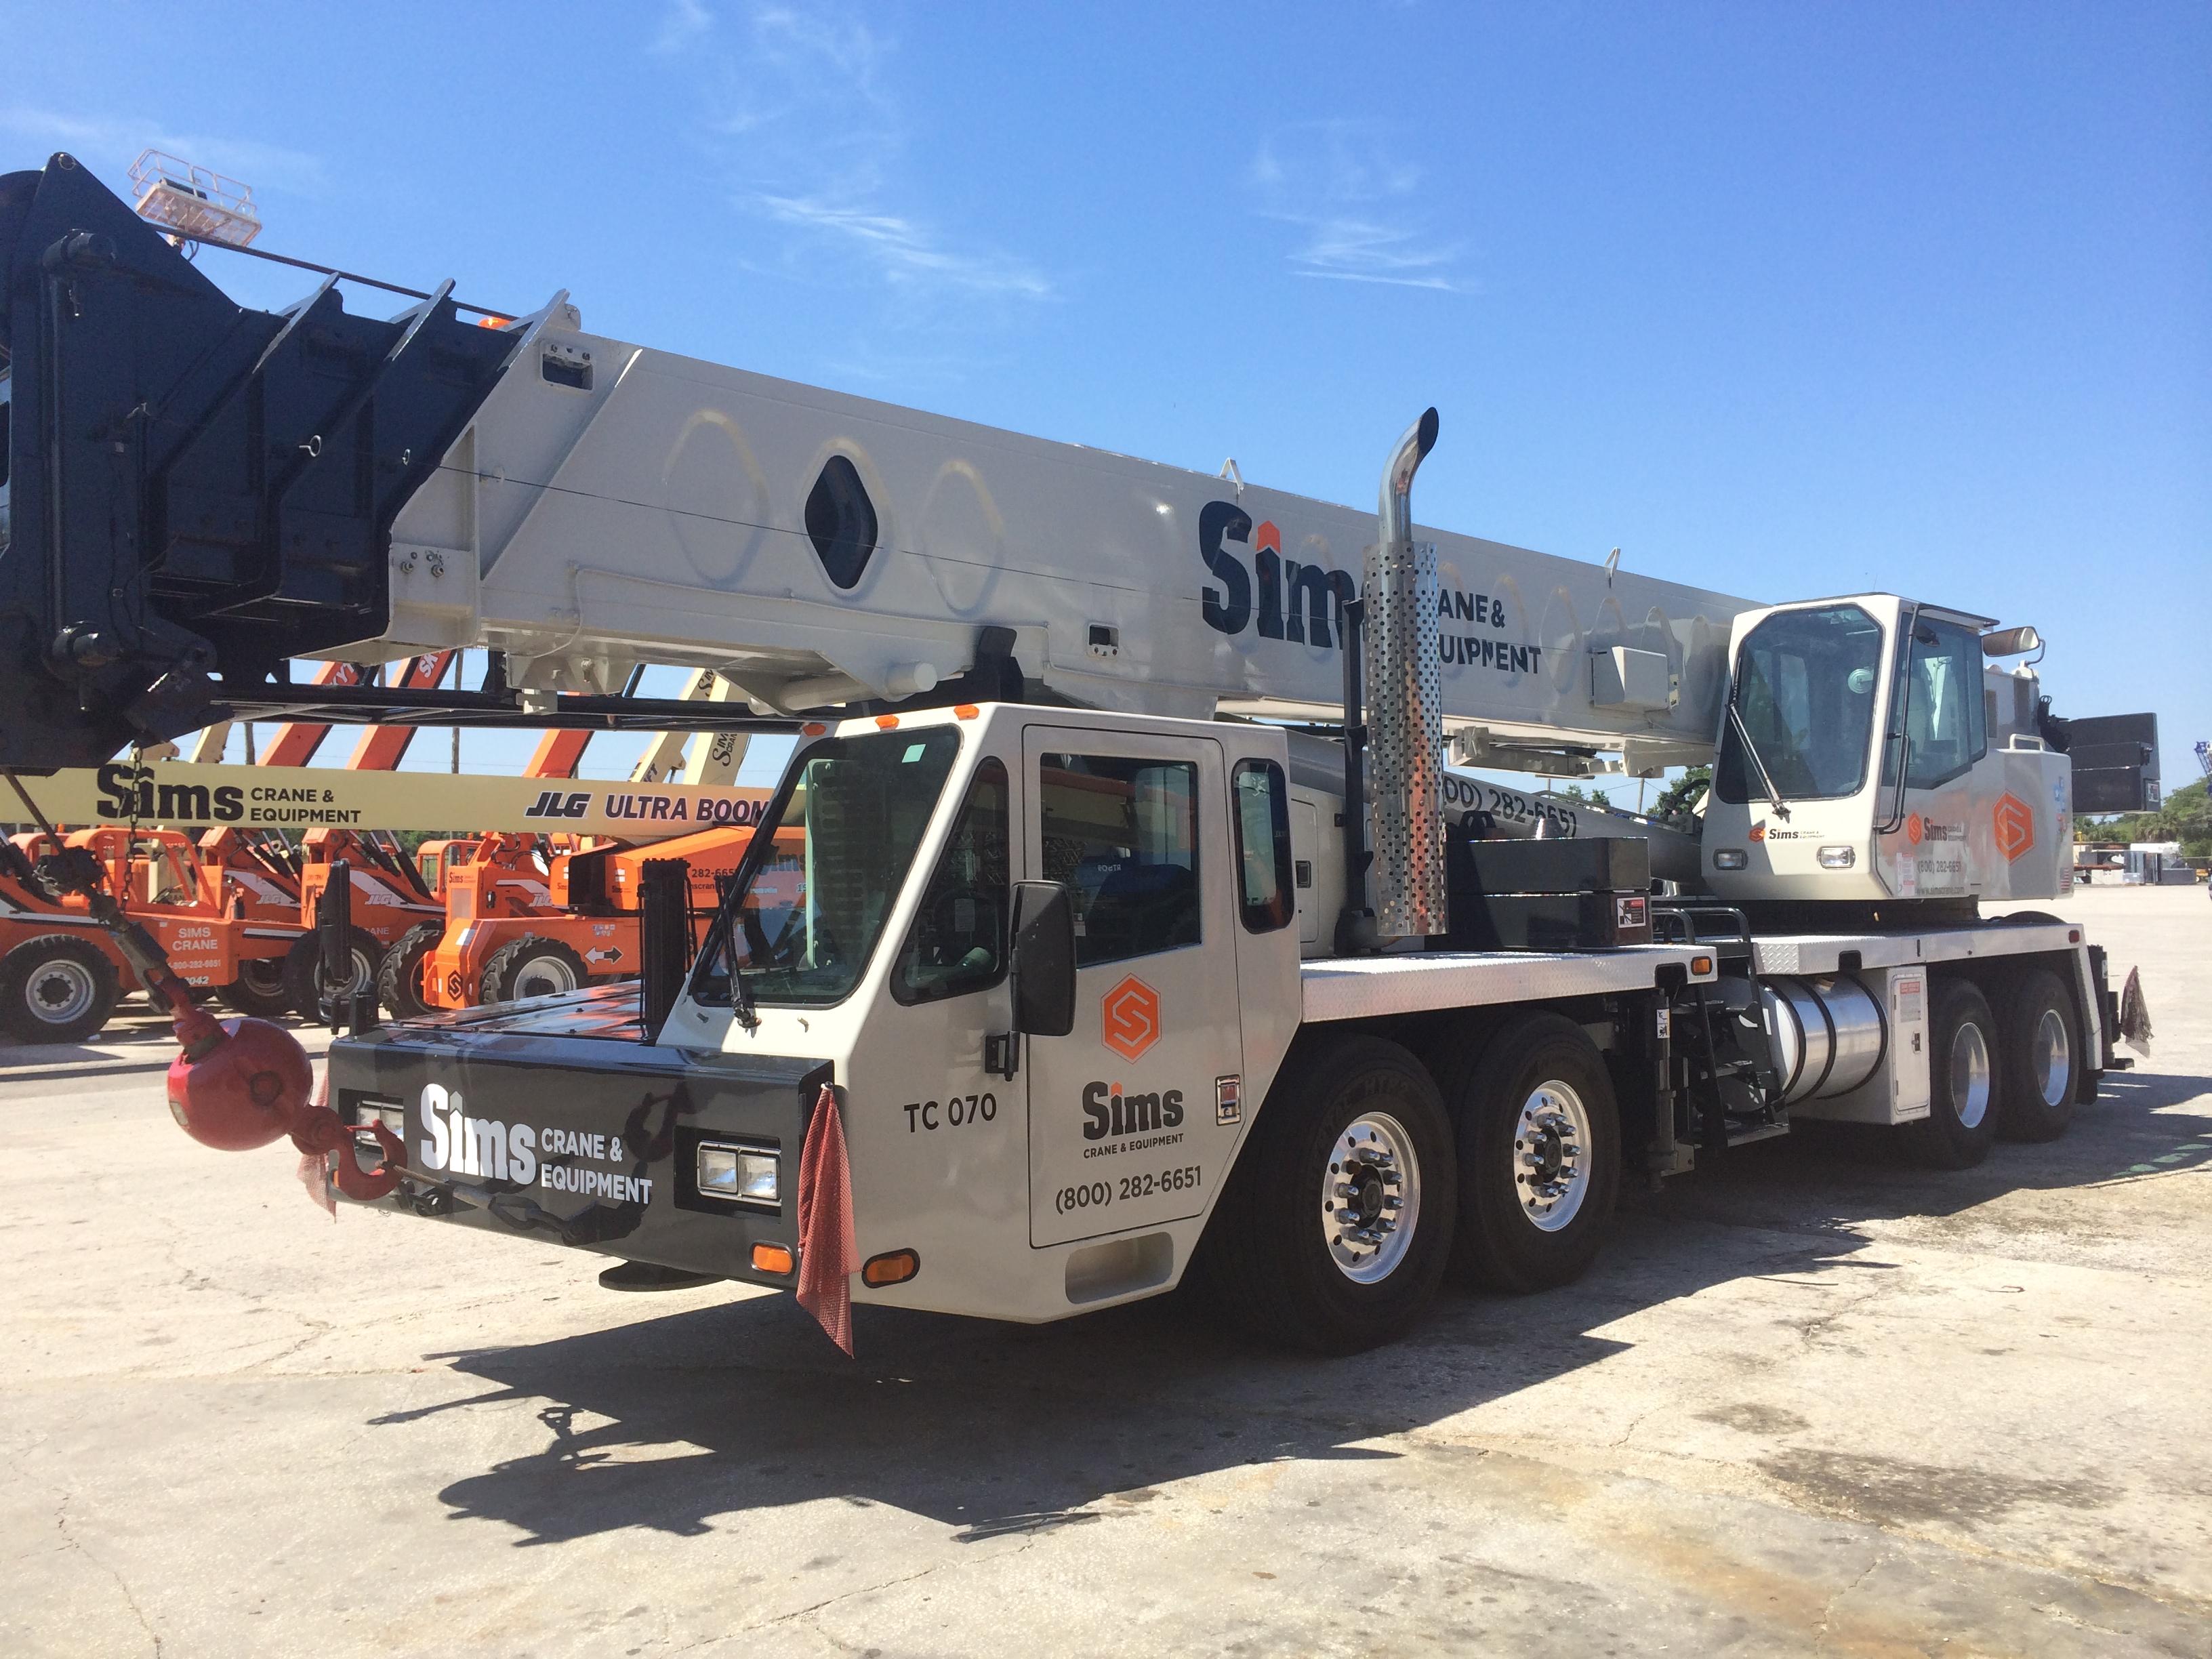 Sims Crane & Equipment Co. image 7